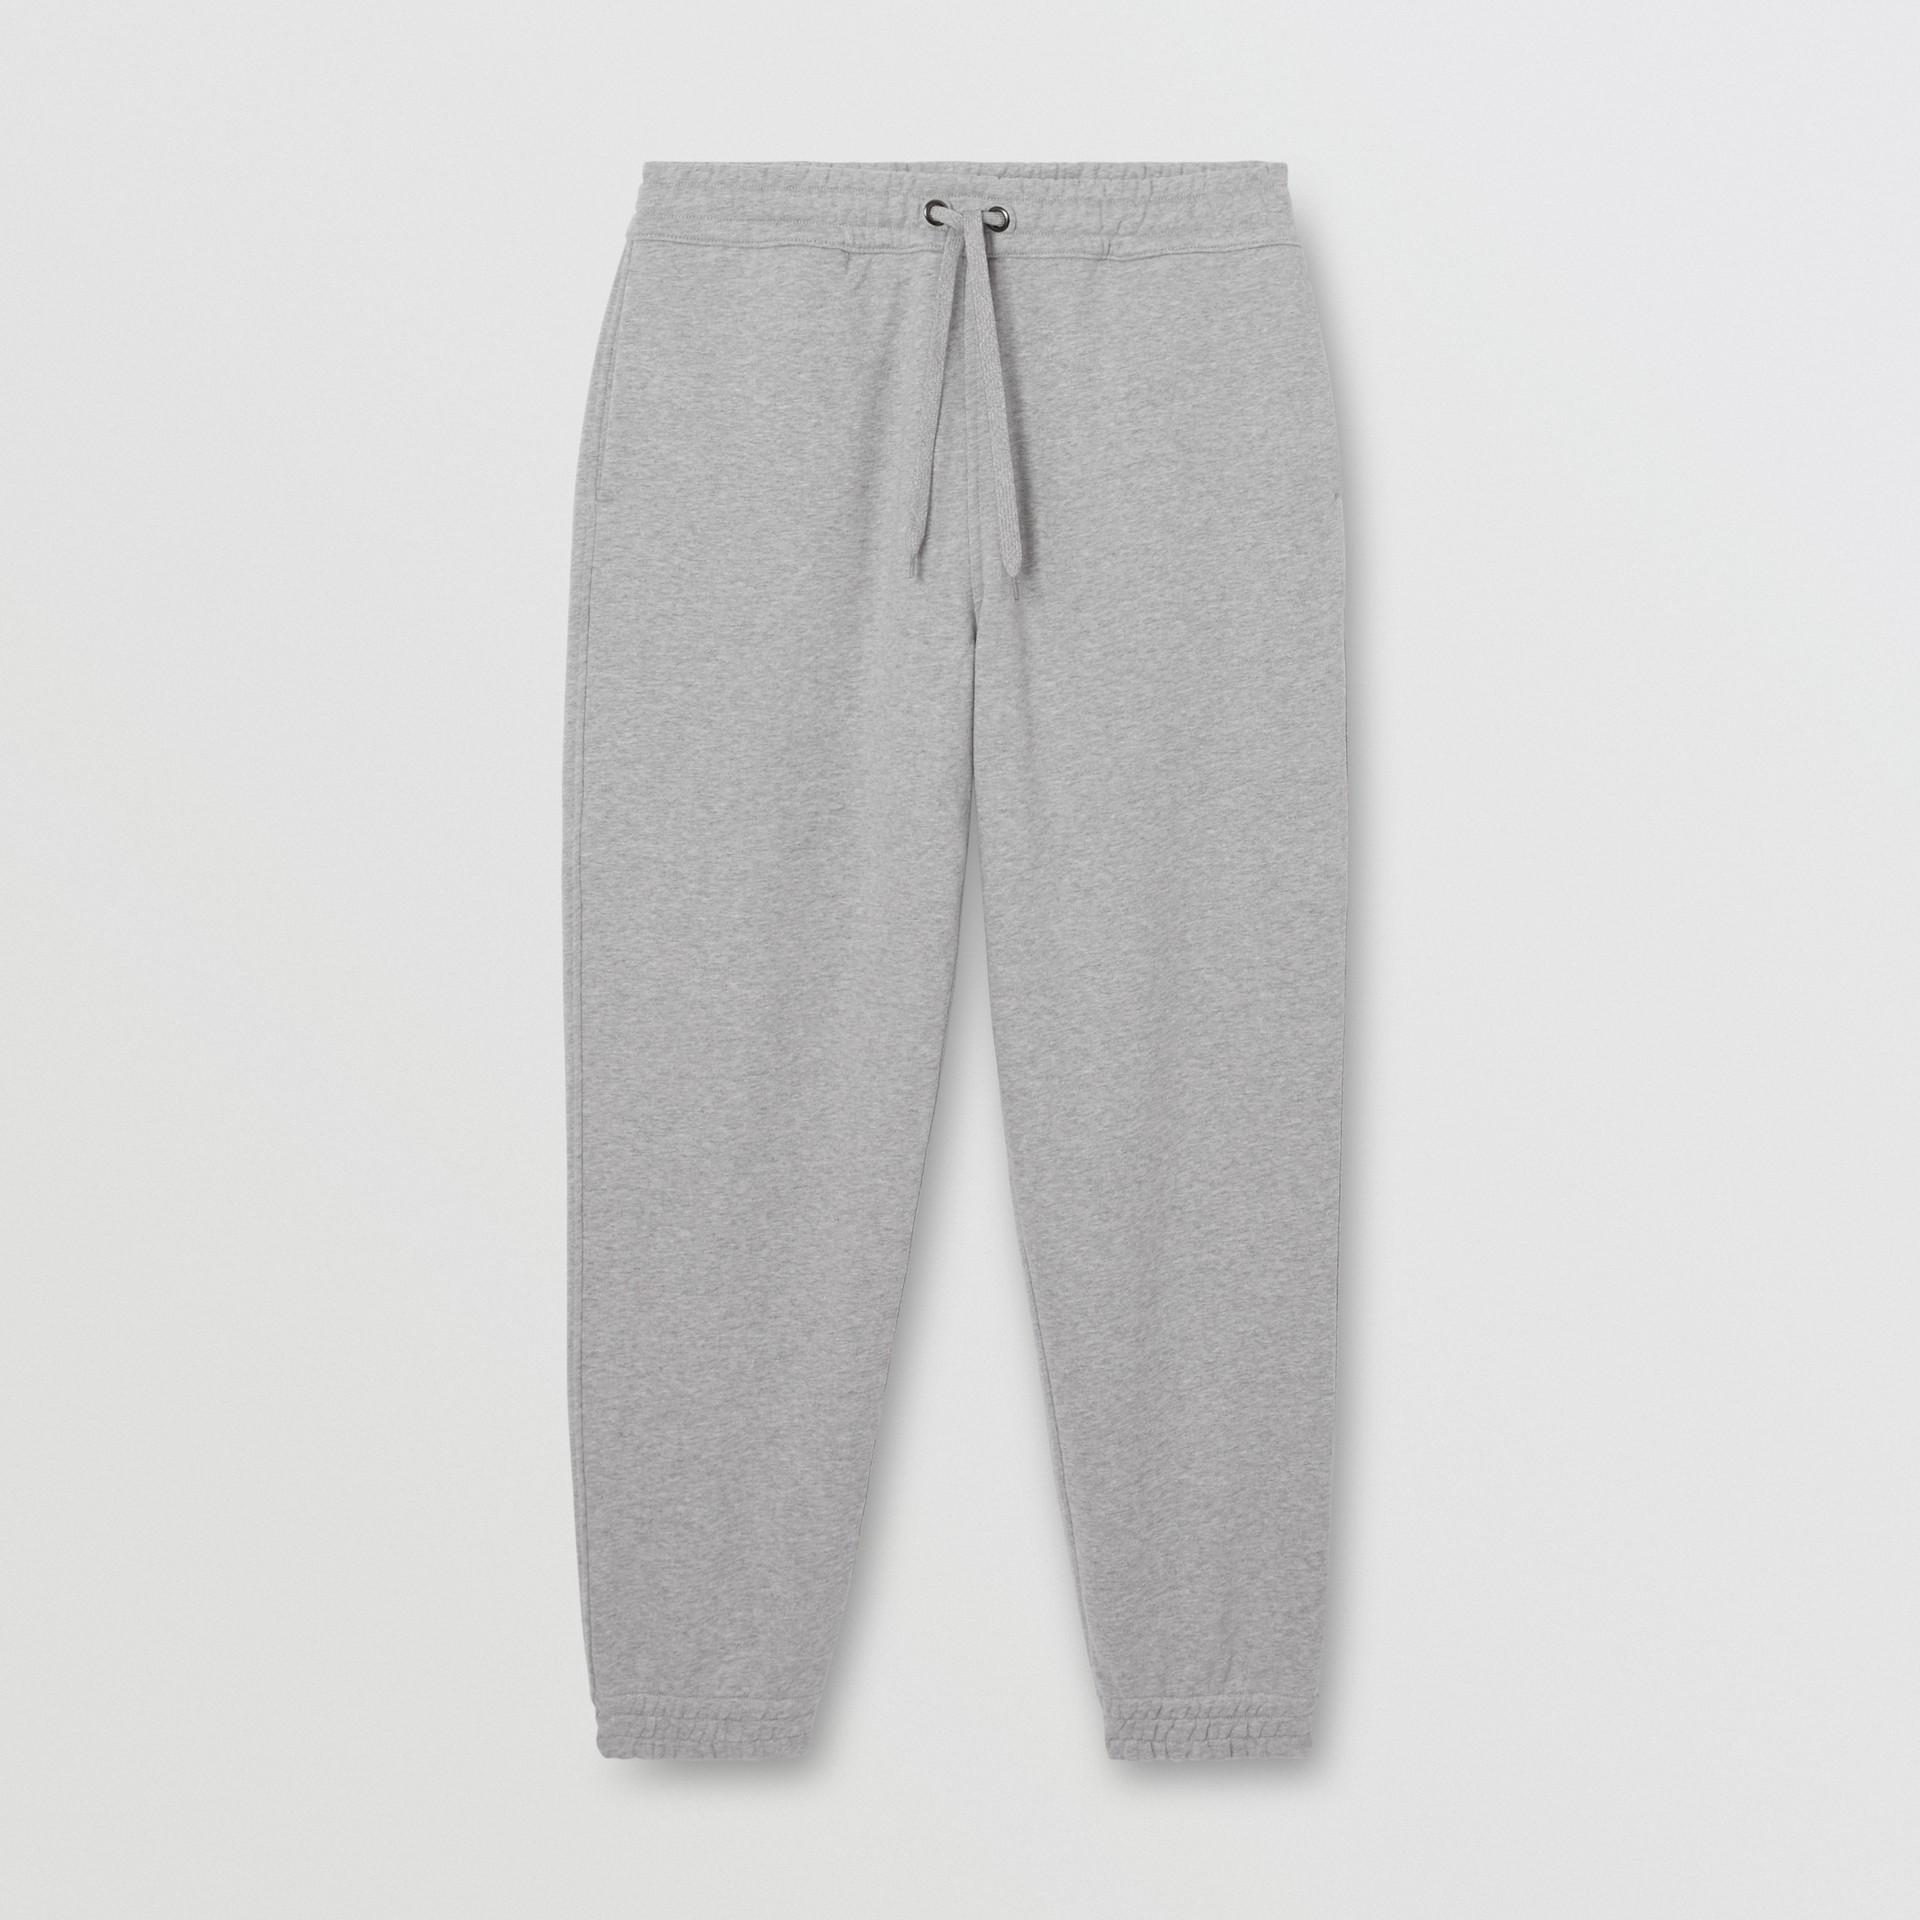 Logo Appliqué Cotton Trackpants in Pale Grey Melange - Men | Burberry - gallery image 3